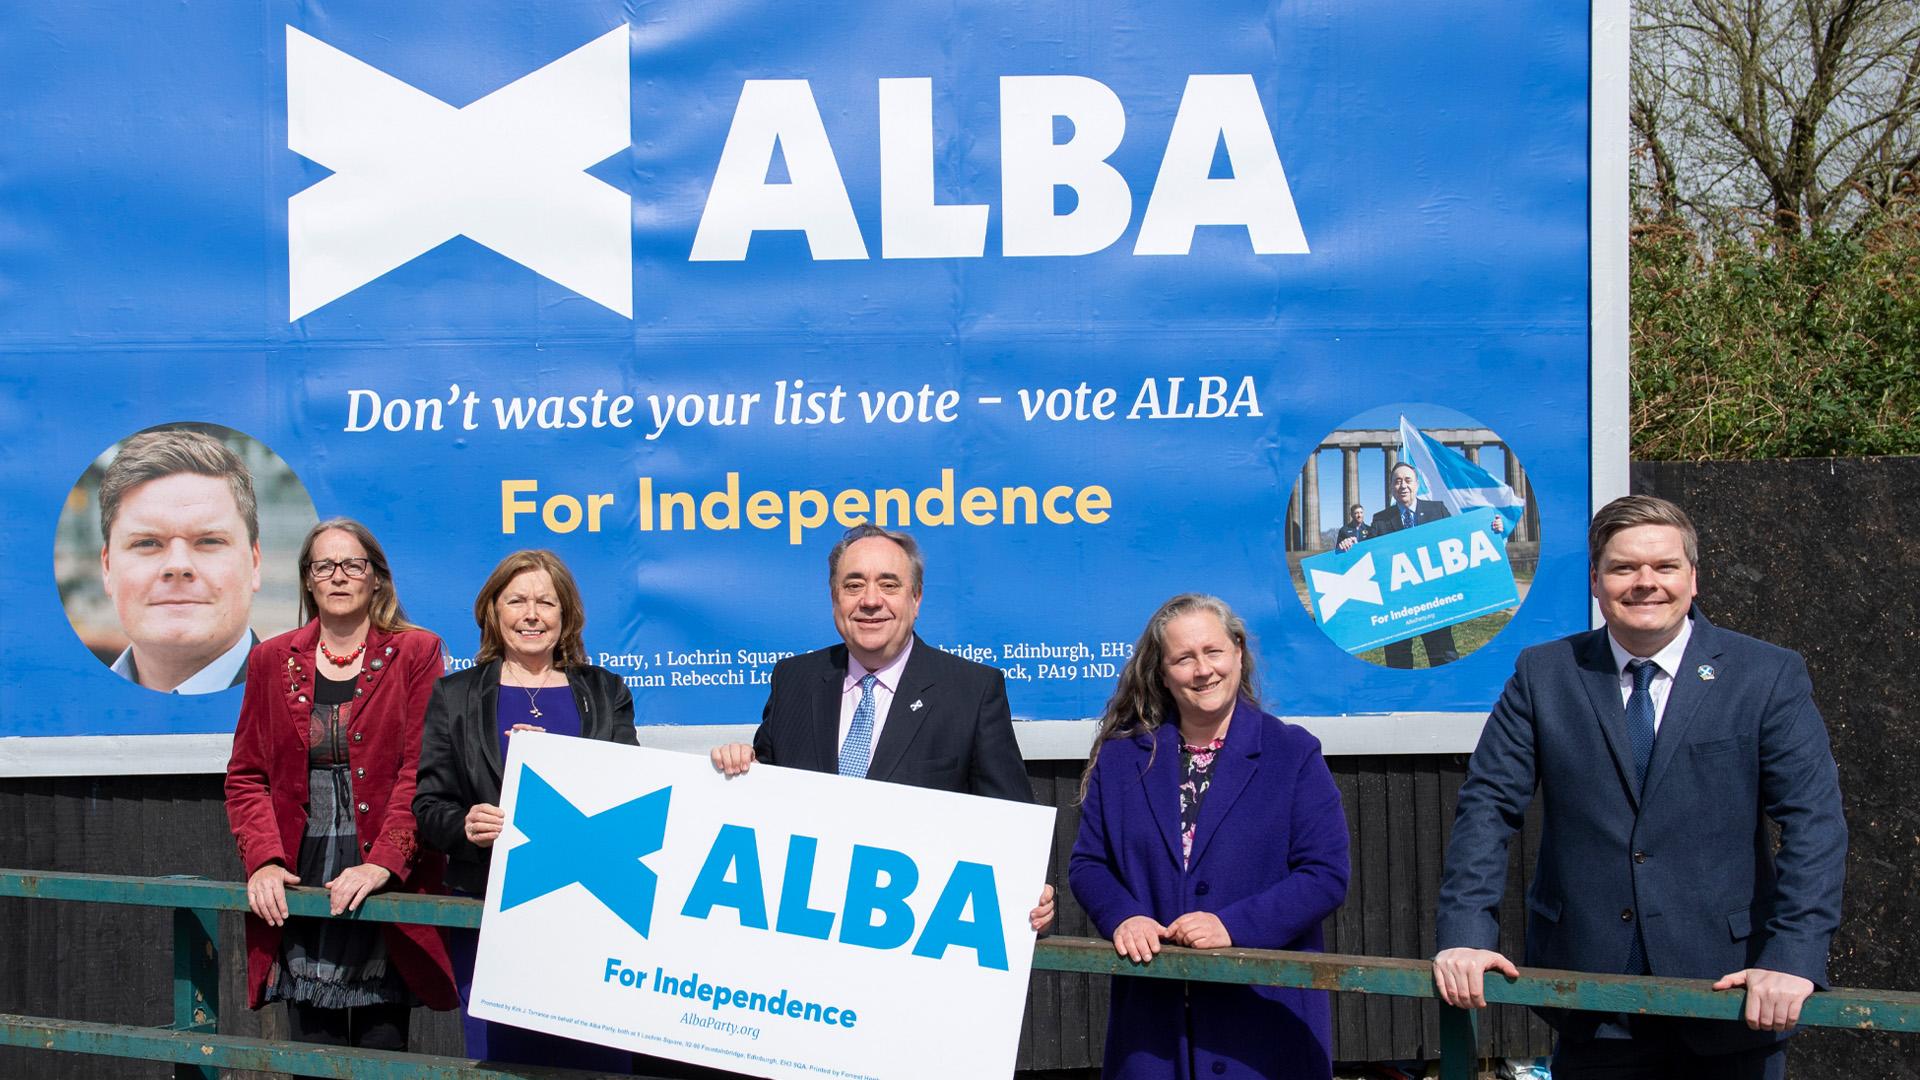 ALBA Leader Alex Salmond unveils five point plan to reduce poverty in Scotland